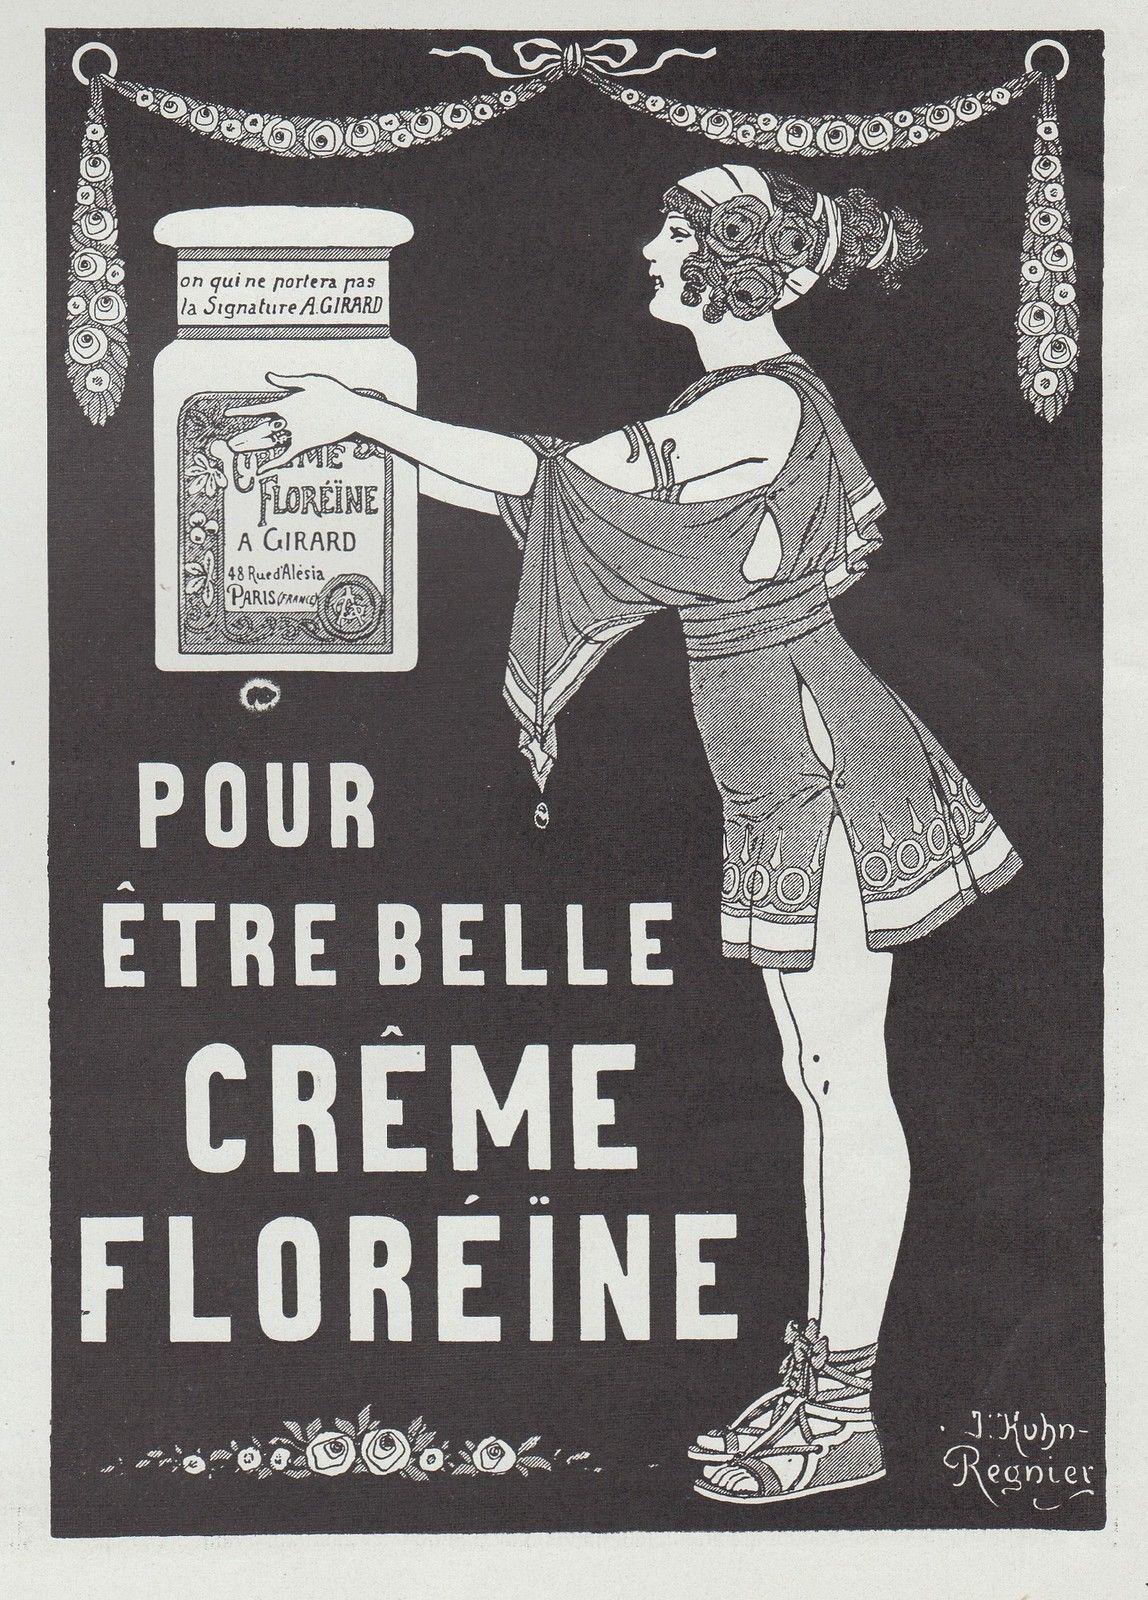 PUBLICITE CREME FLOREINE COSMETIQUE SOINS VISAGE COSMETIC